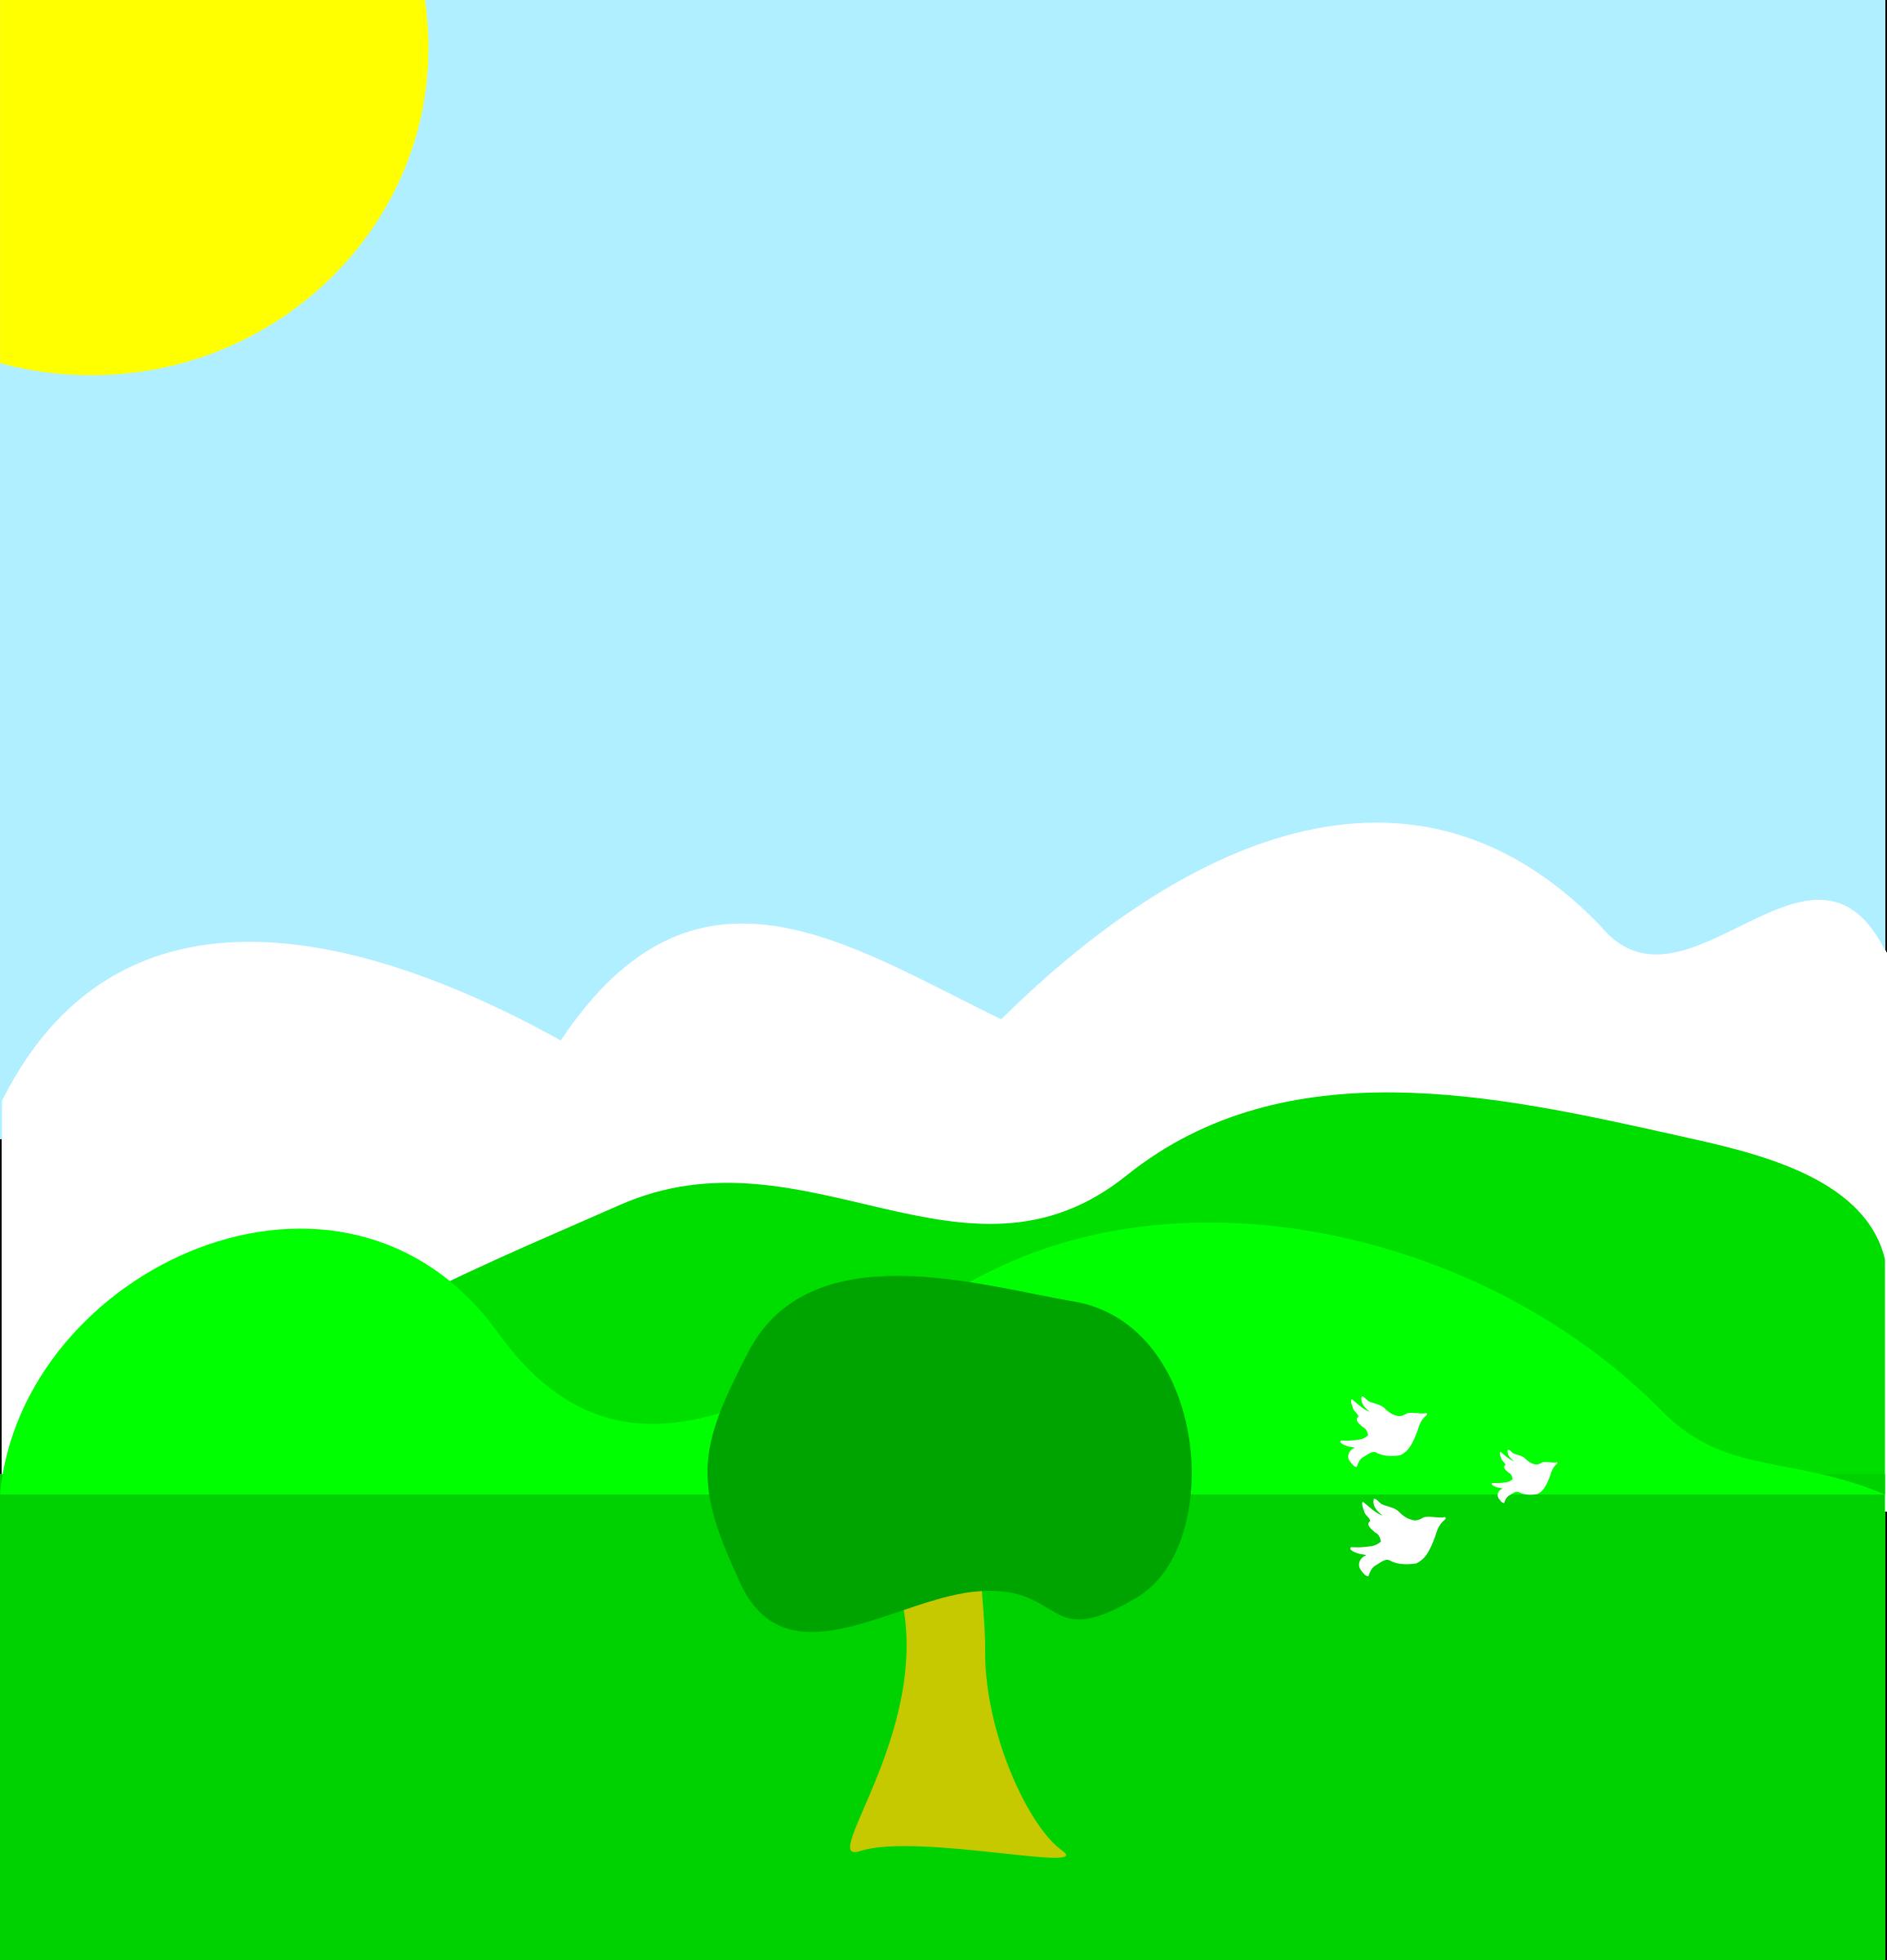 Scenery clipart sun sky #5